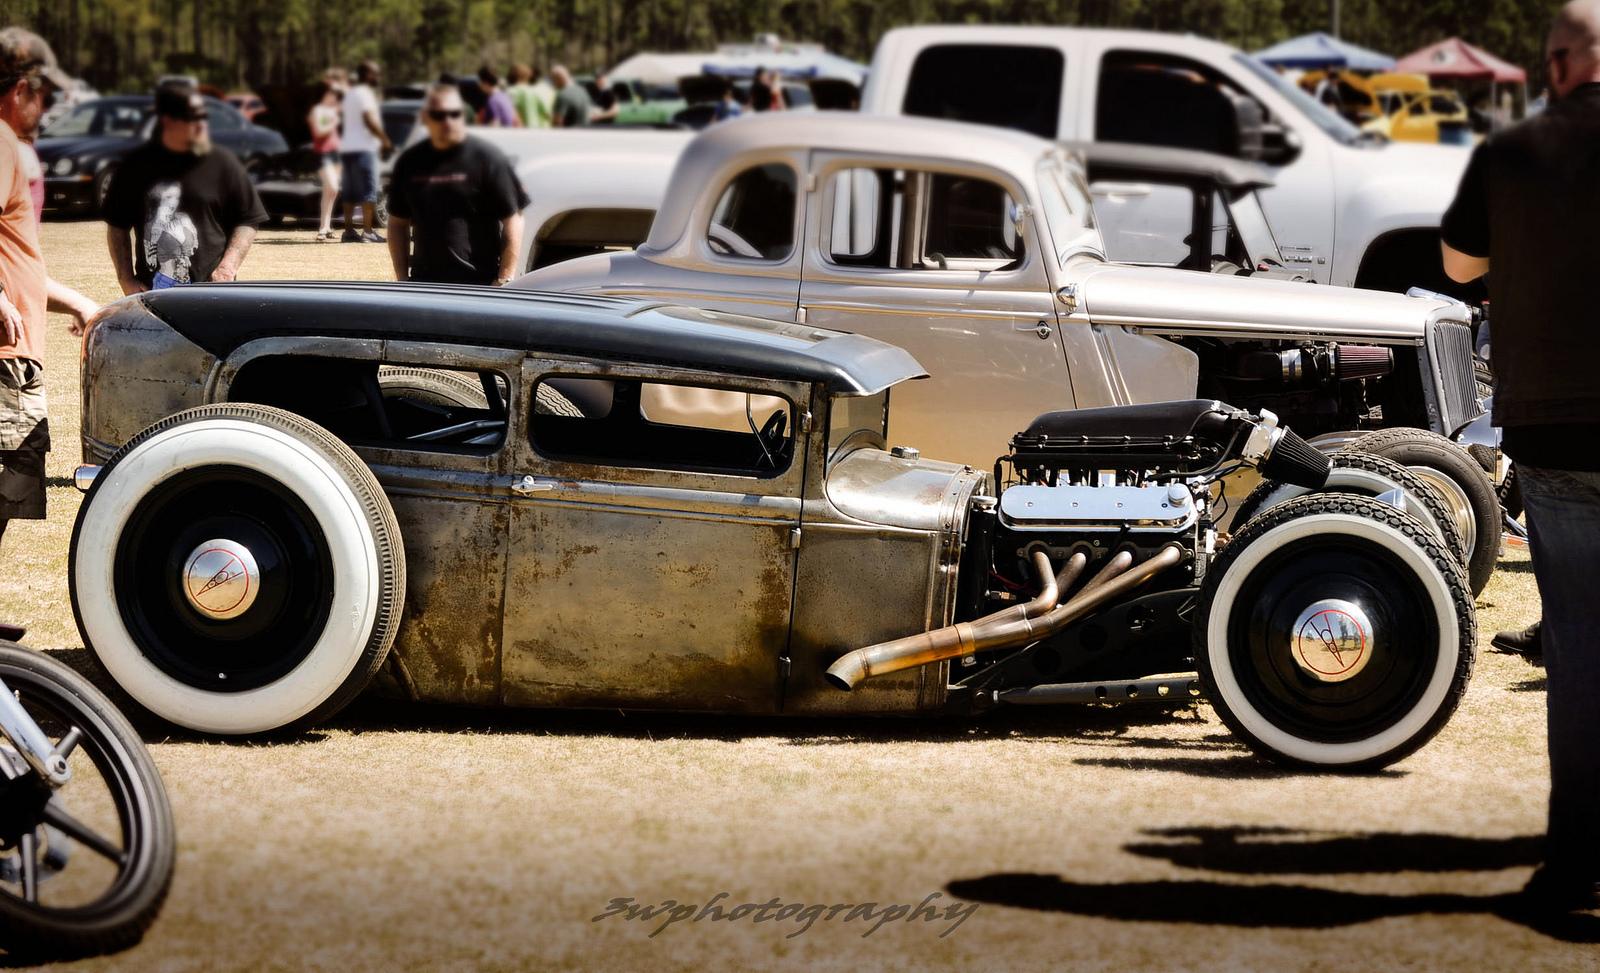 Fantastic Tudor Rat Rod For Sale Images - Classic Cars Ideas - boiq.info